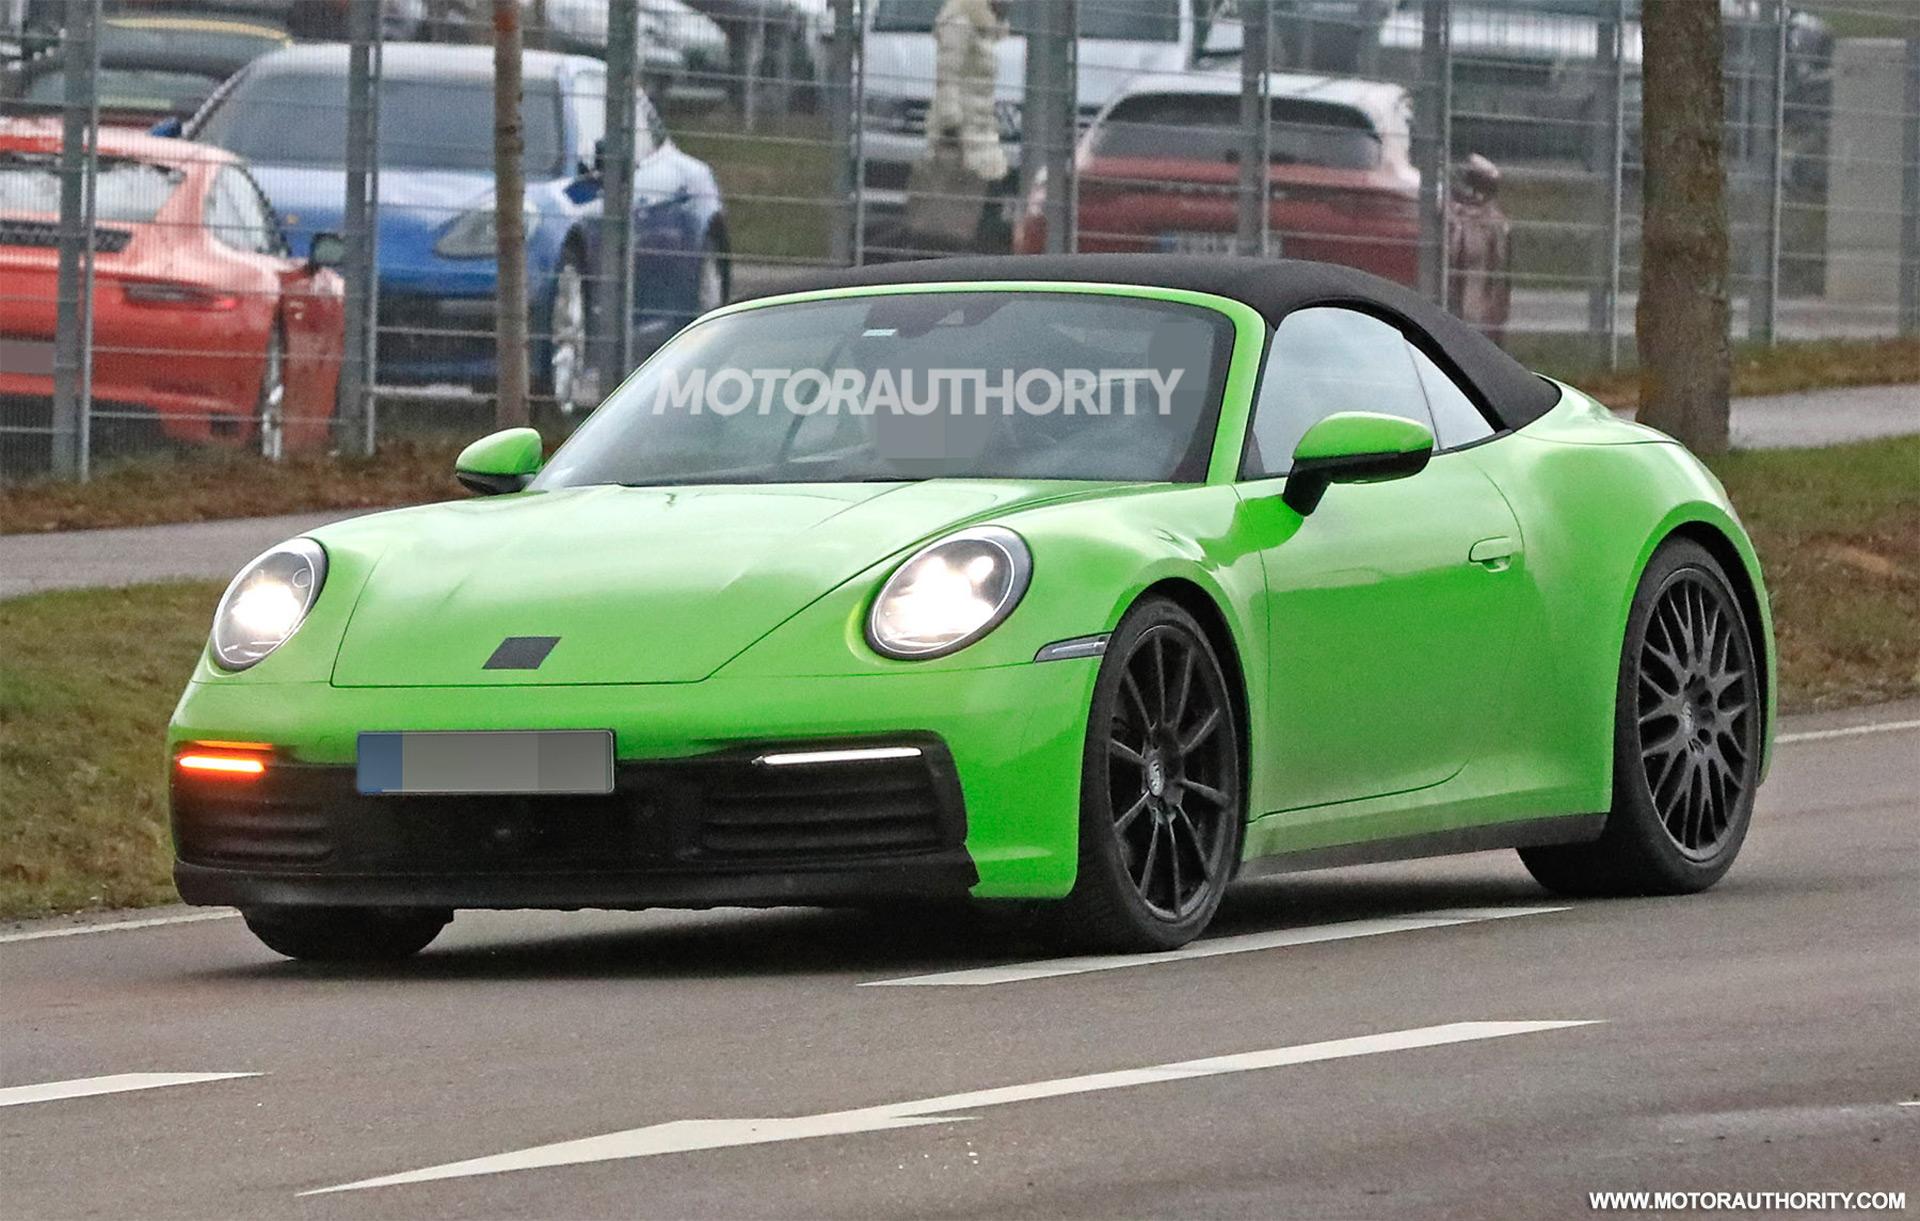 2020 Porsche 911 Cabriolet Spy Shots